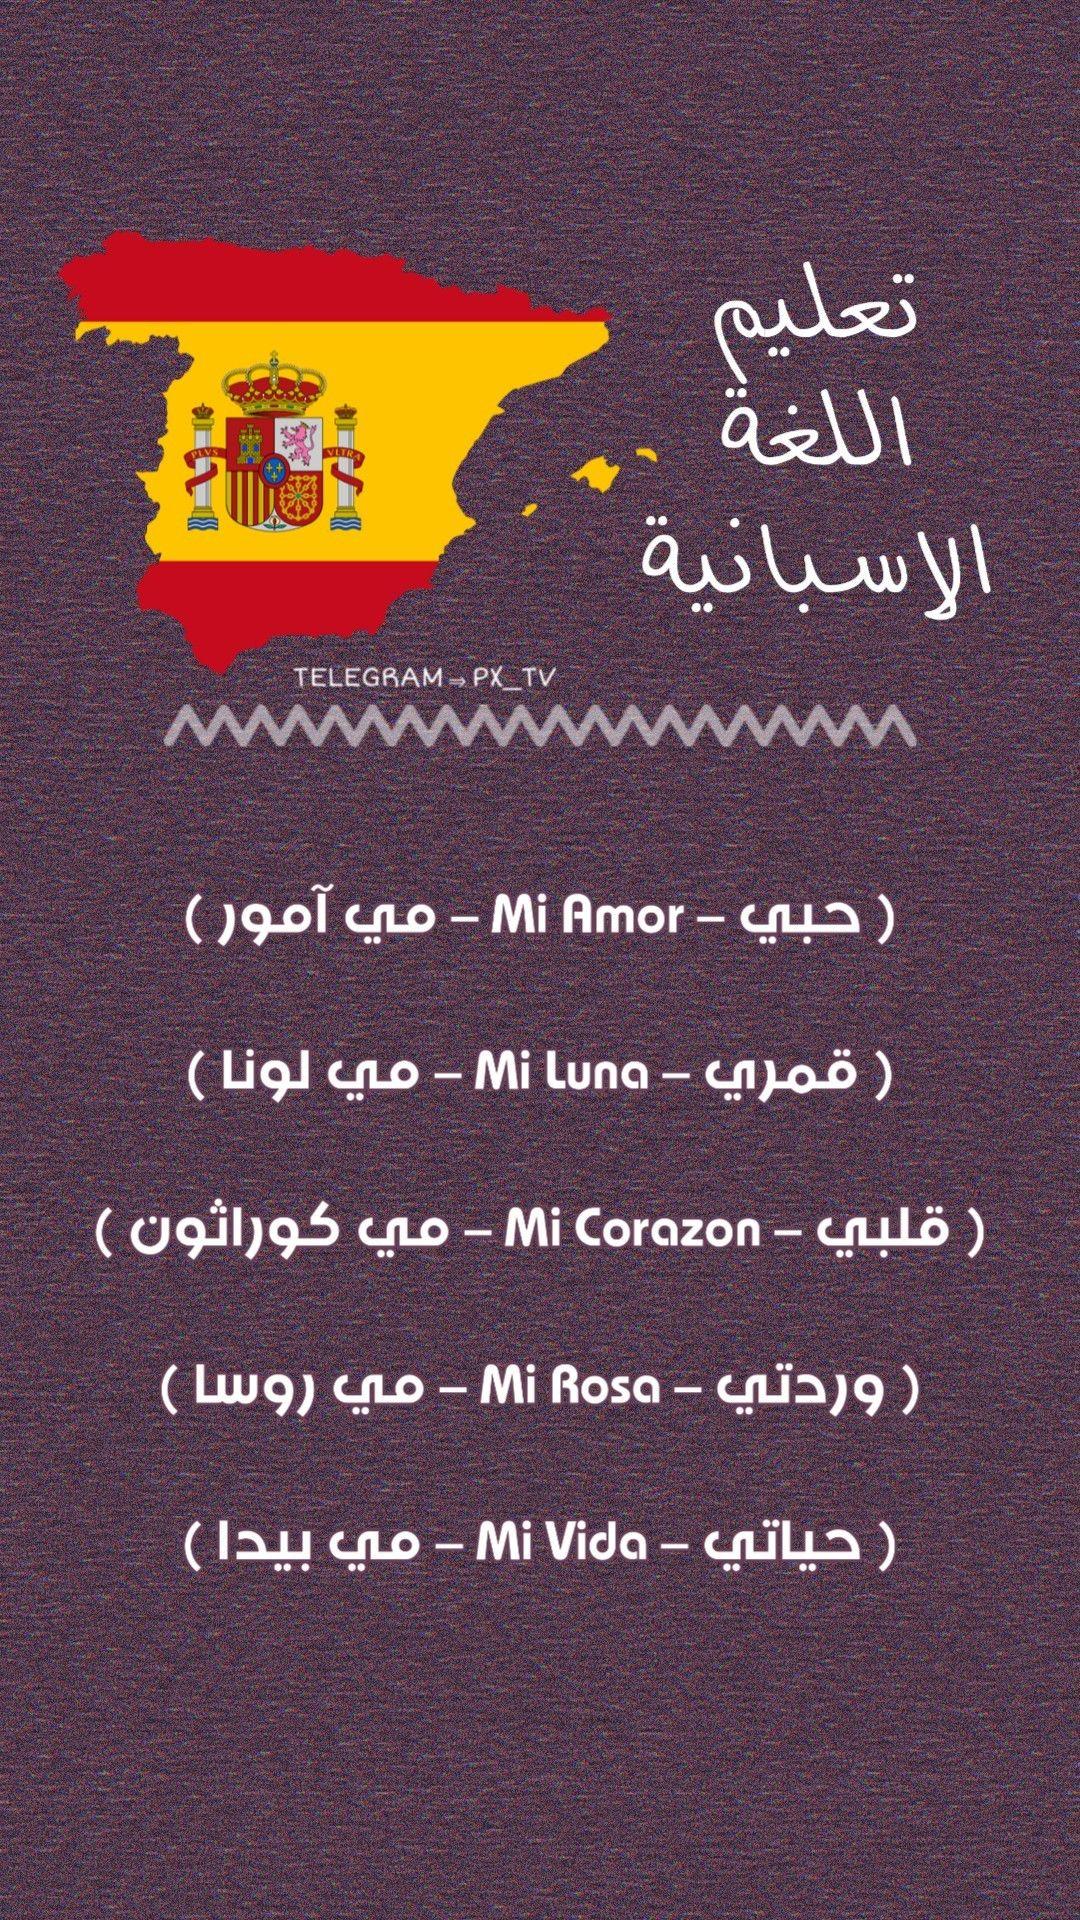 تابعوا قناتنه ع تلكرام Px Tv افكار ستوريات منوعات برامج سنابات افلام Spanish Words For Beginners Spanish Language Learning Learning Spanish Vocabulary